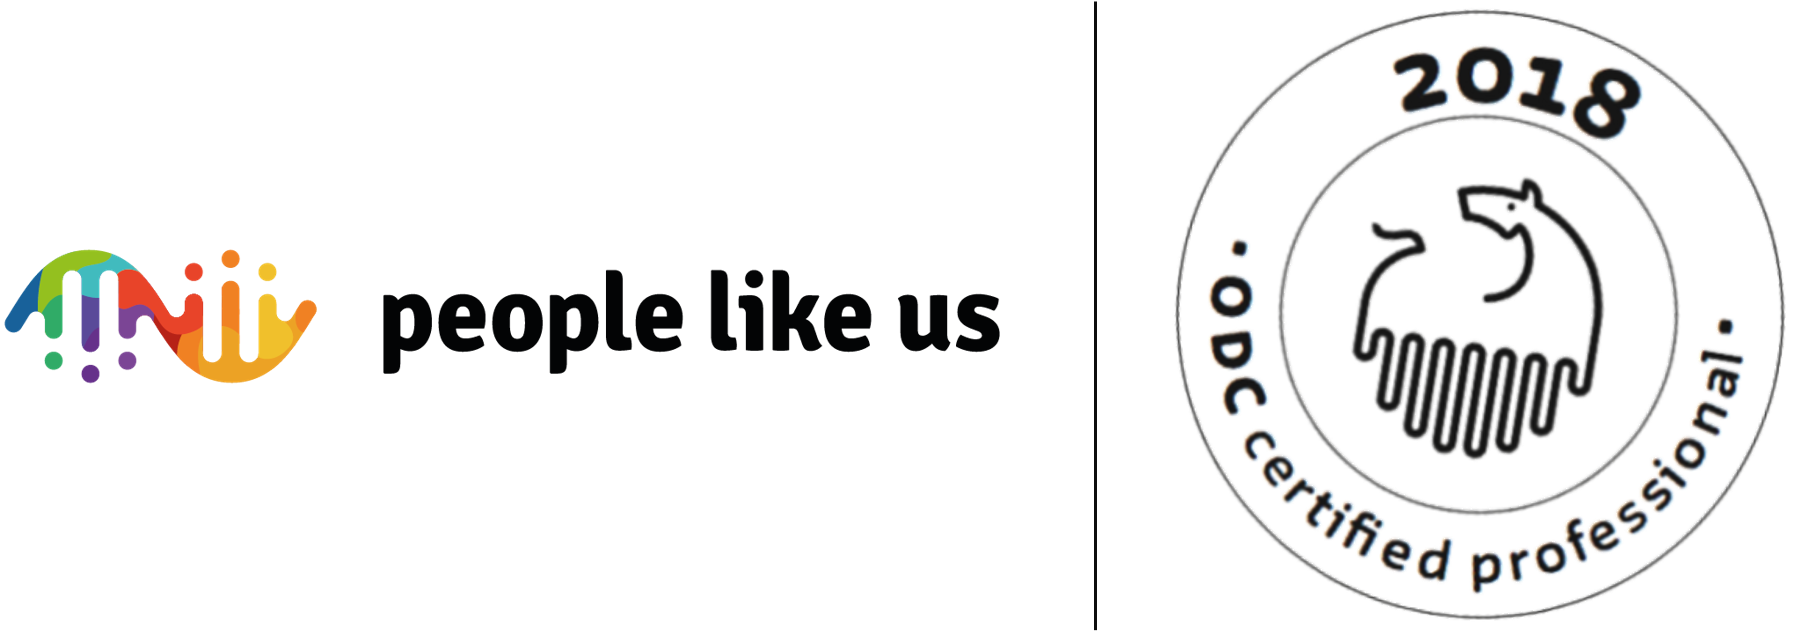 Talent scan - people like us